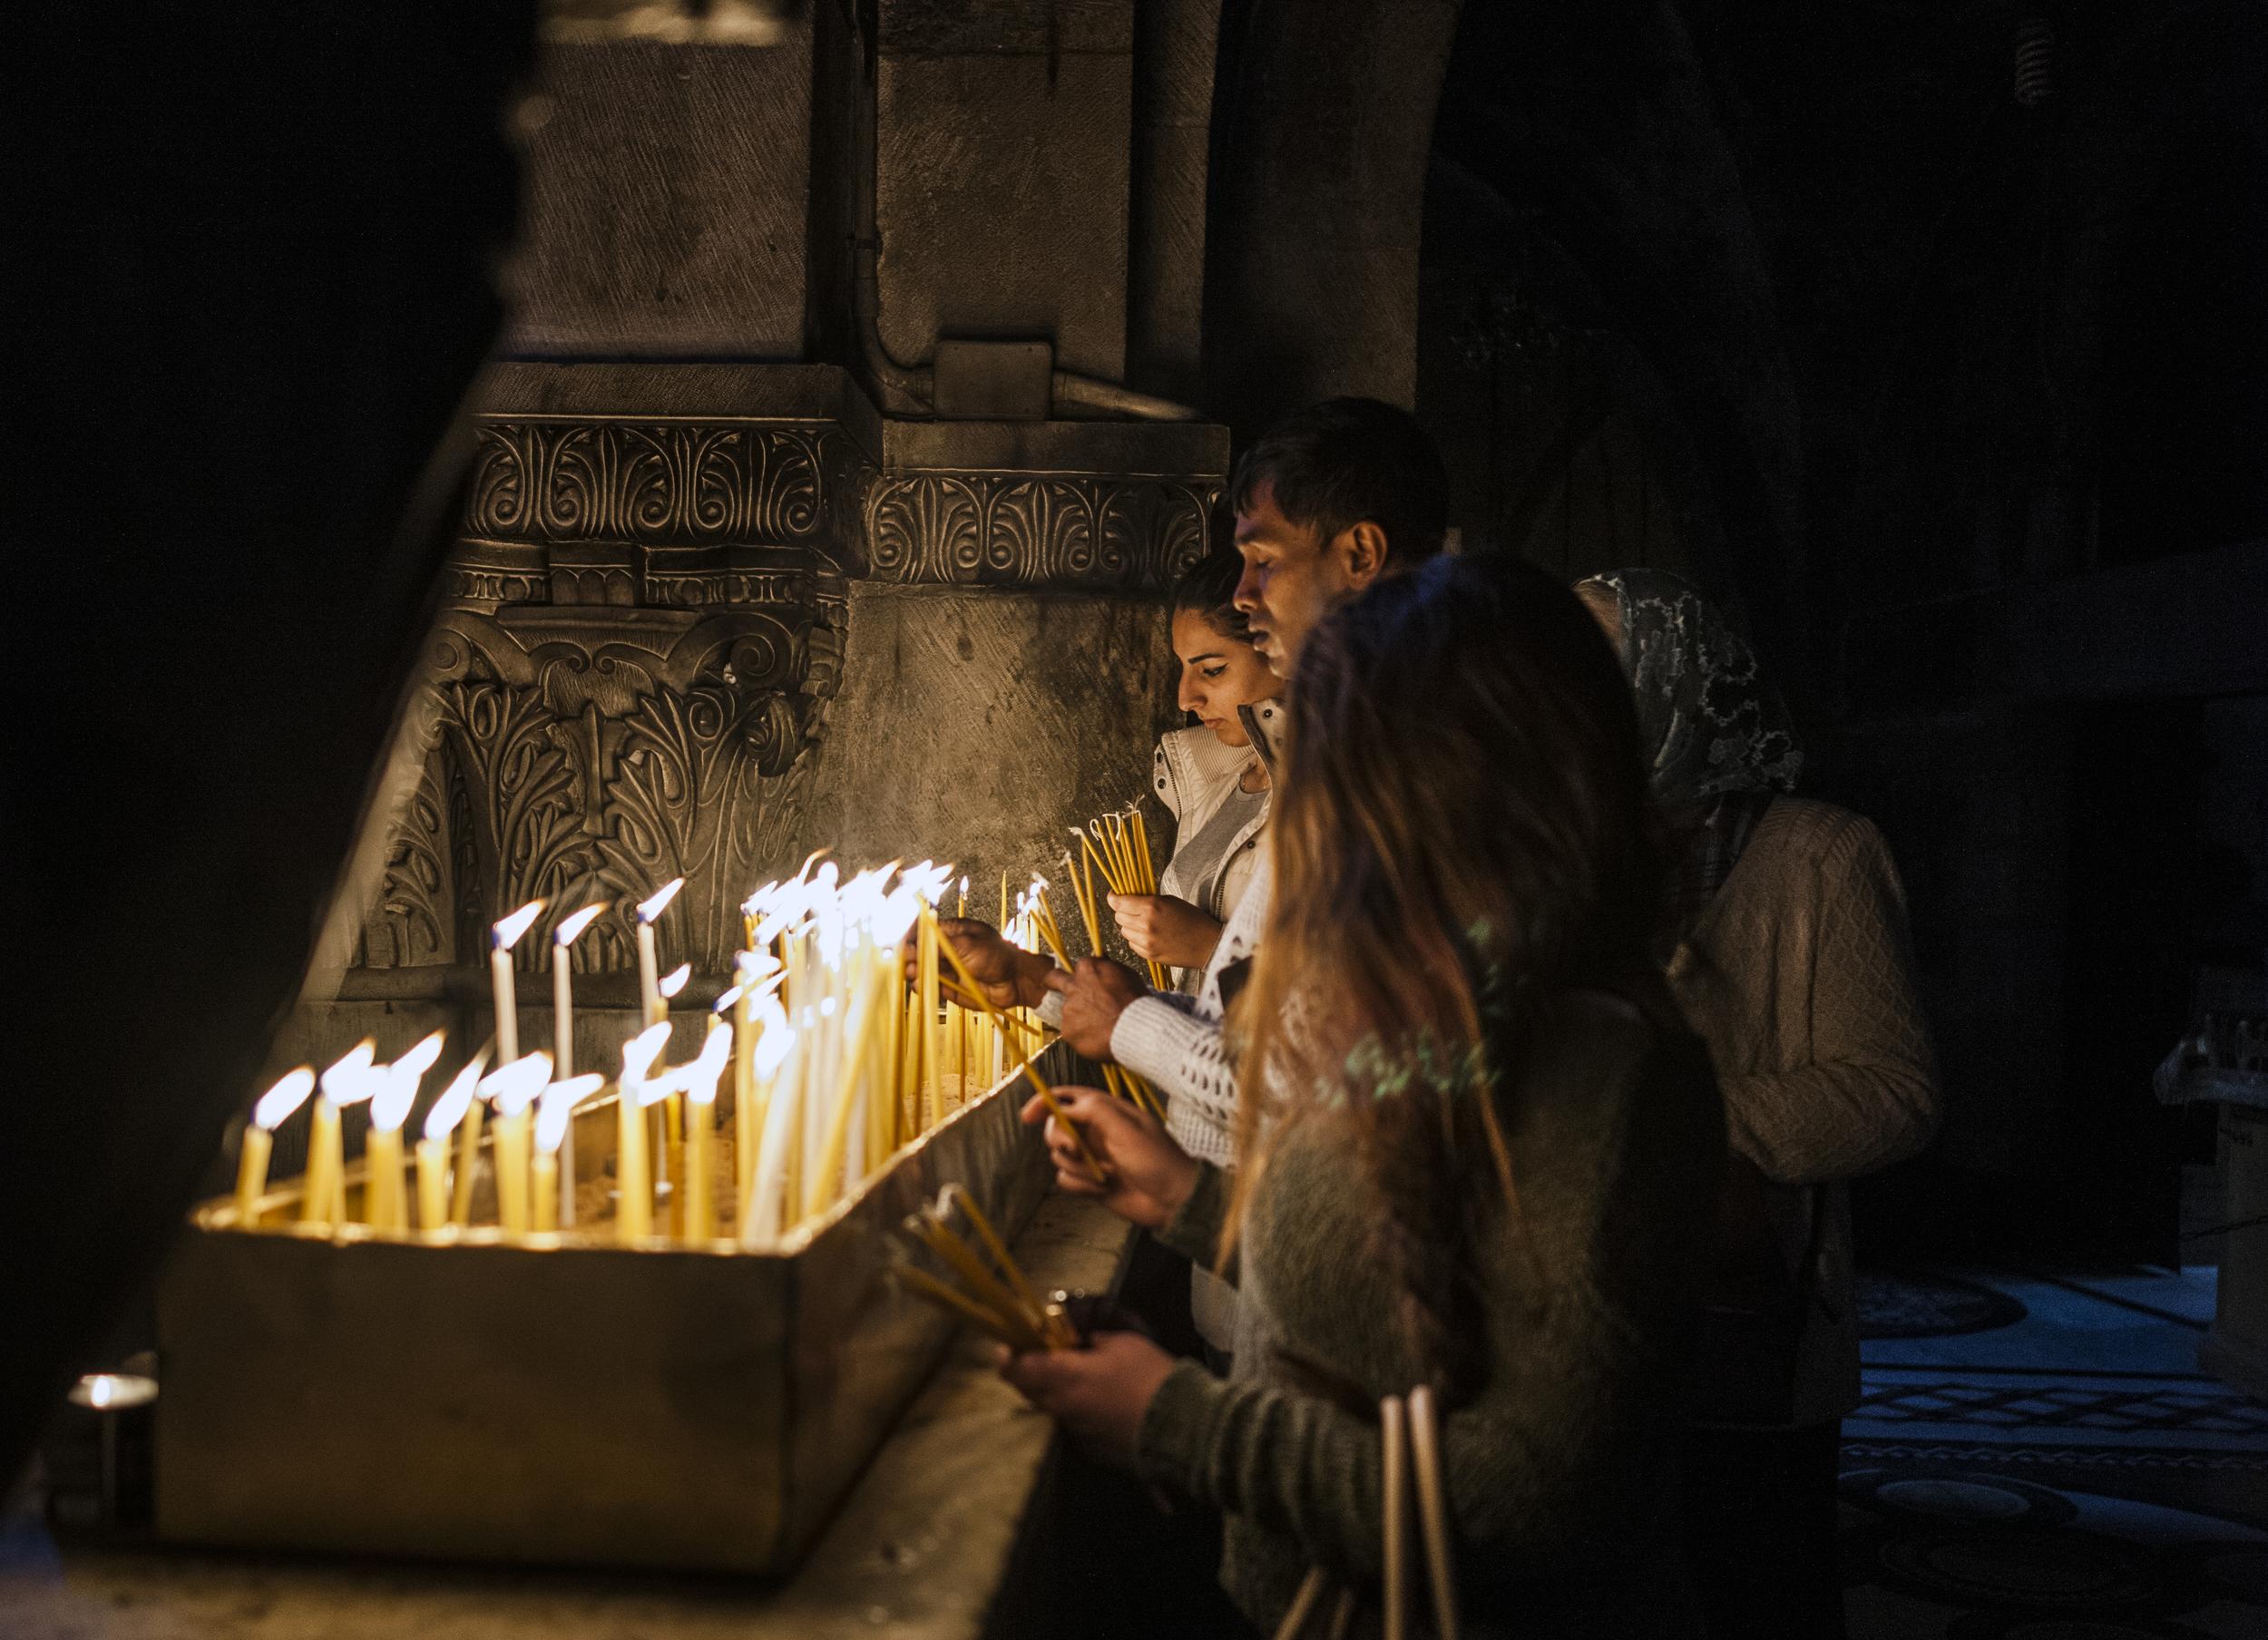 Church of Holy Sepulchre, Jerusalem - Israel